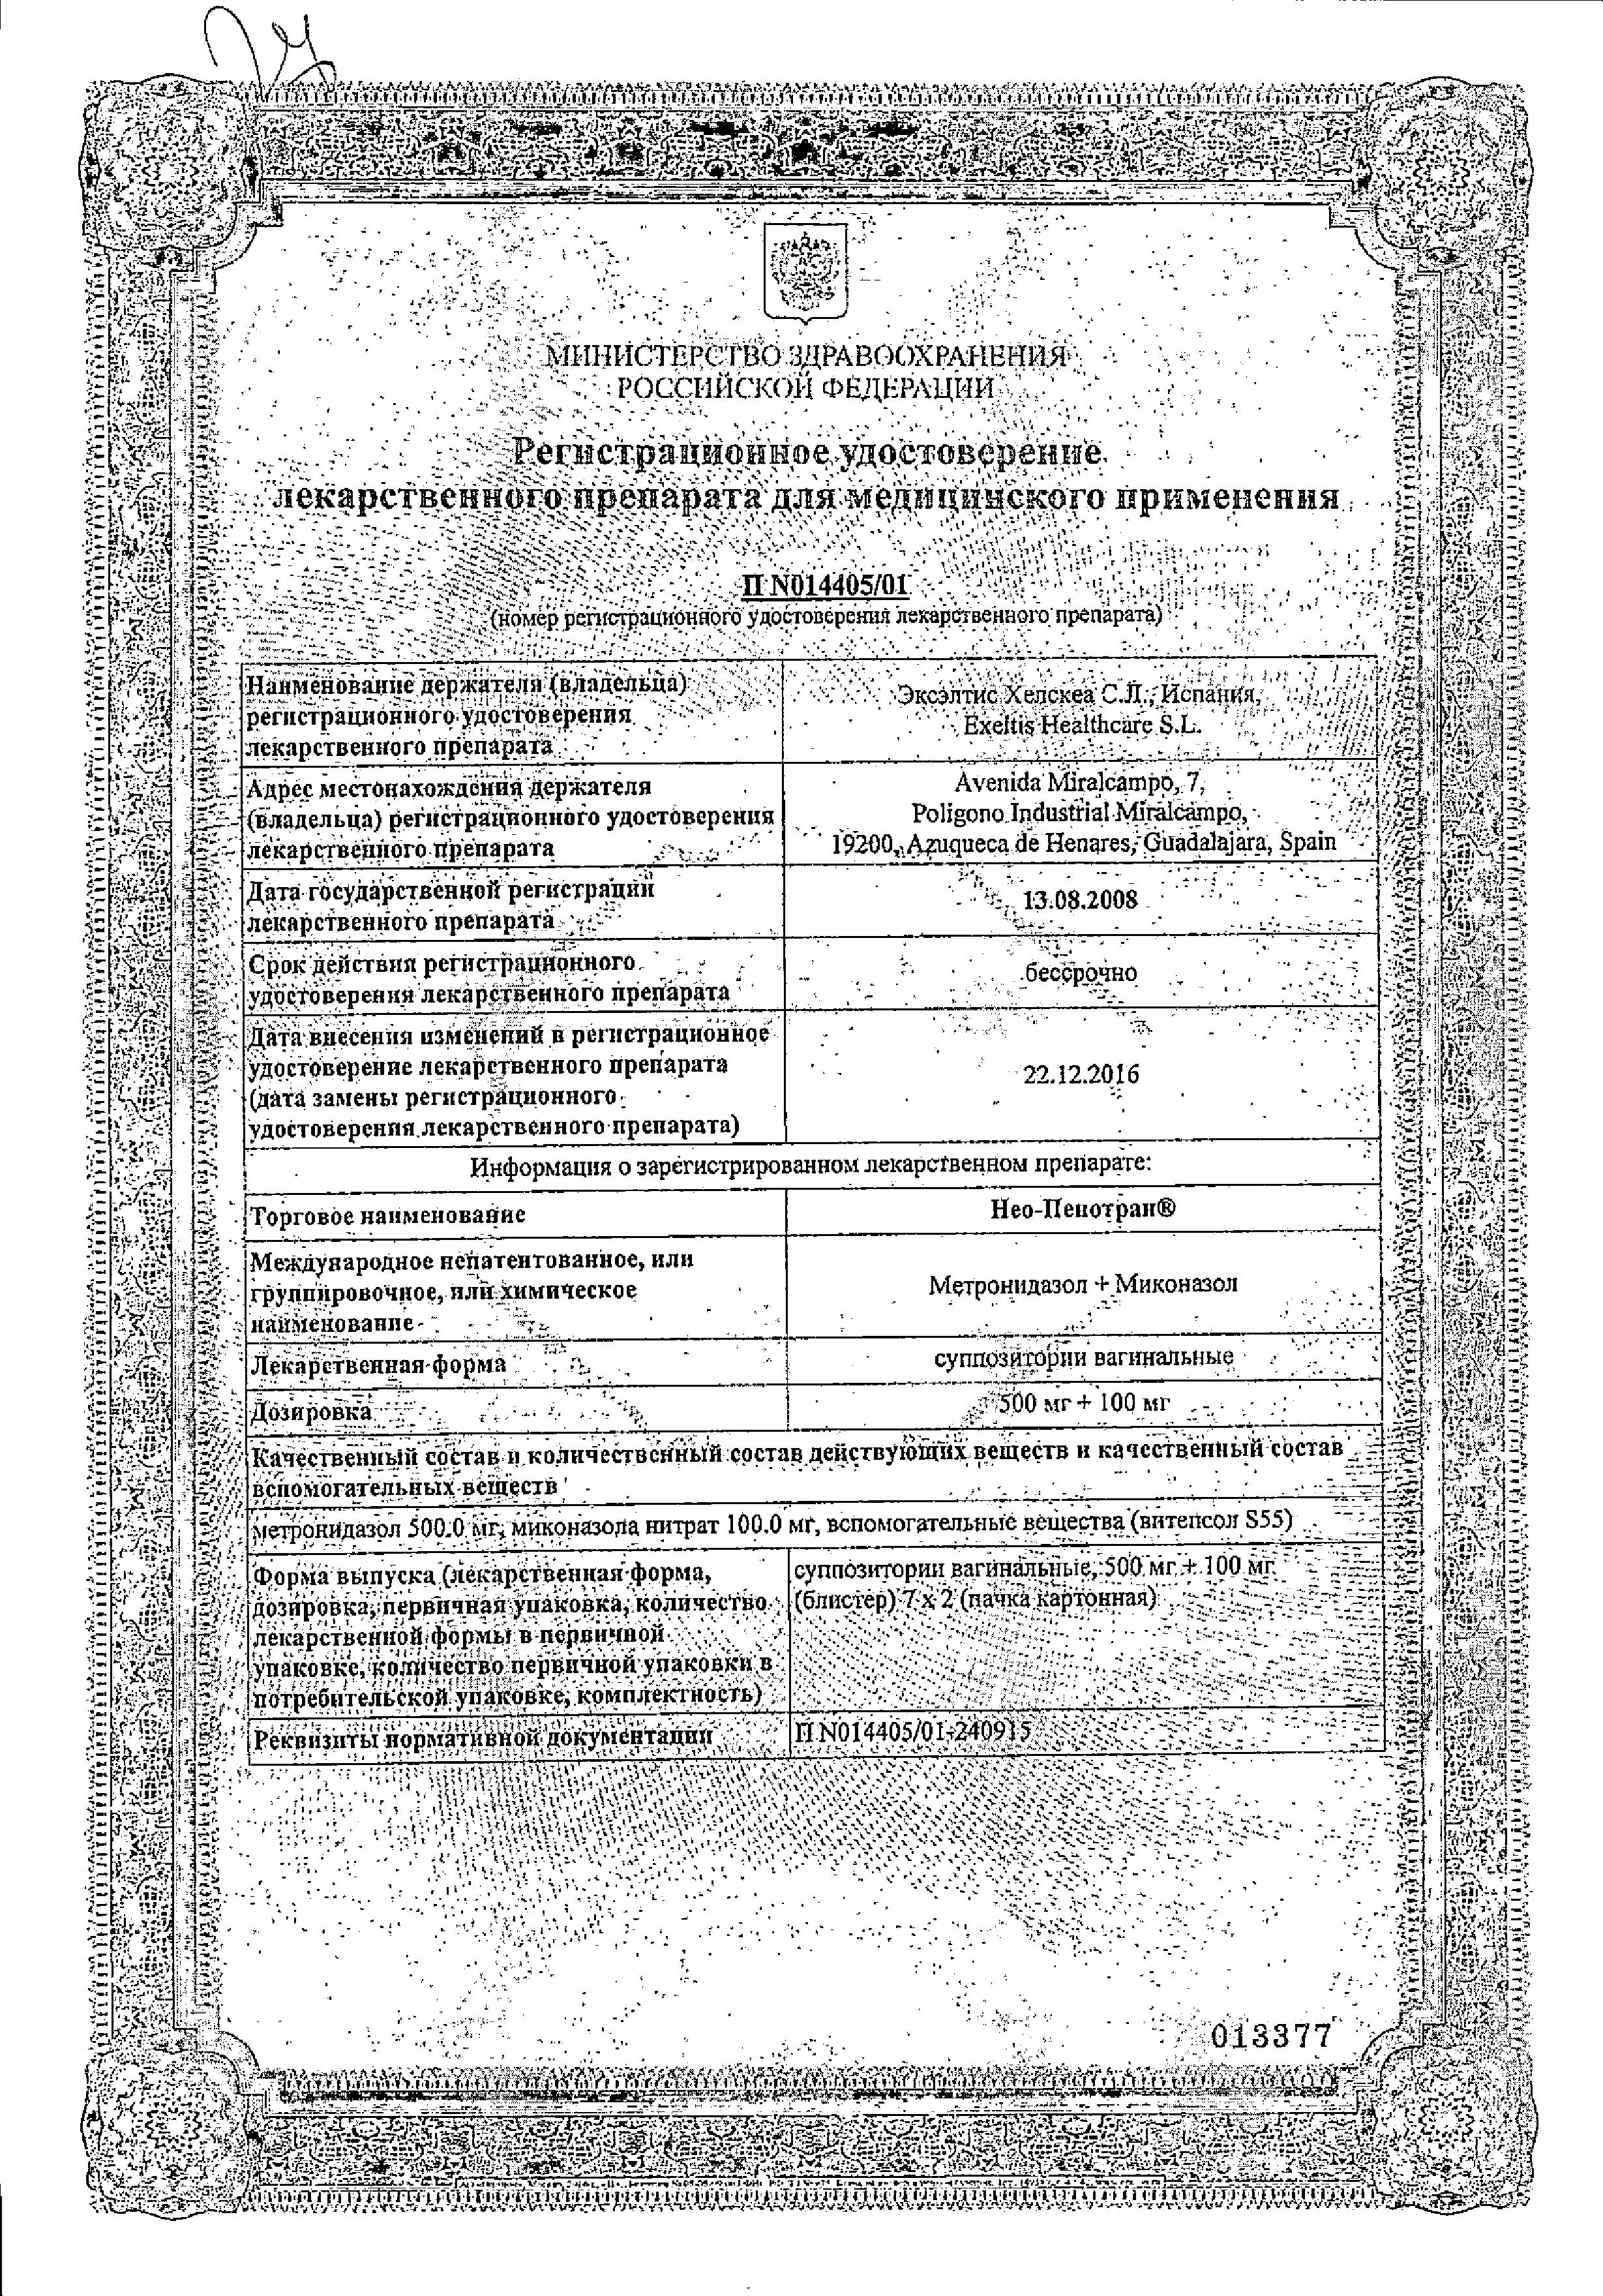 Нео-Пенотран сертификат